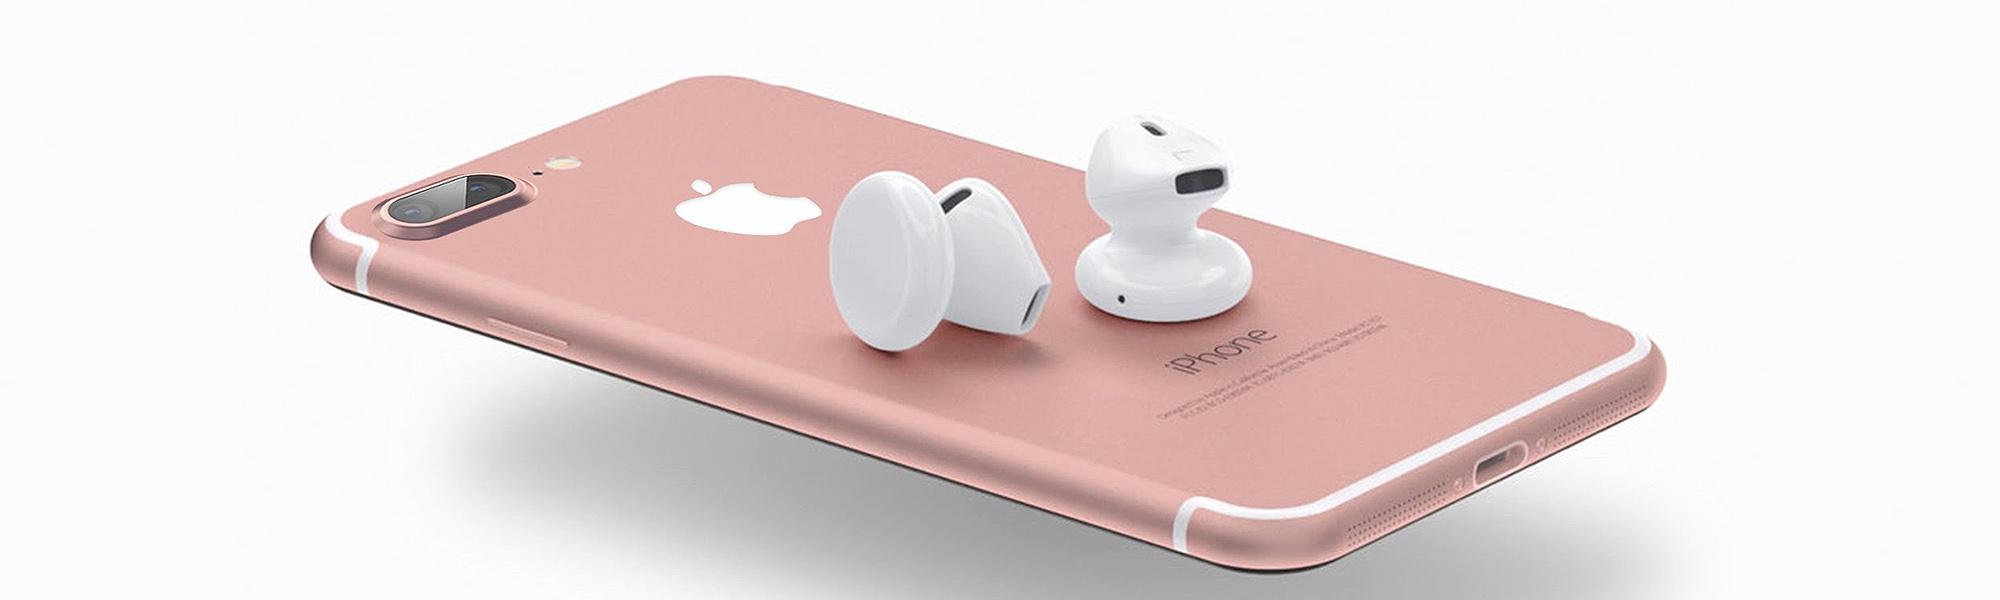 iphone2jpg